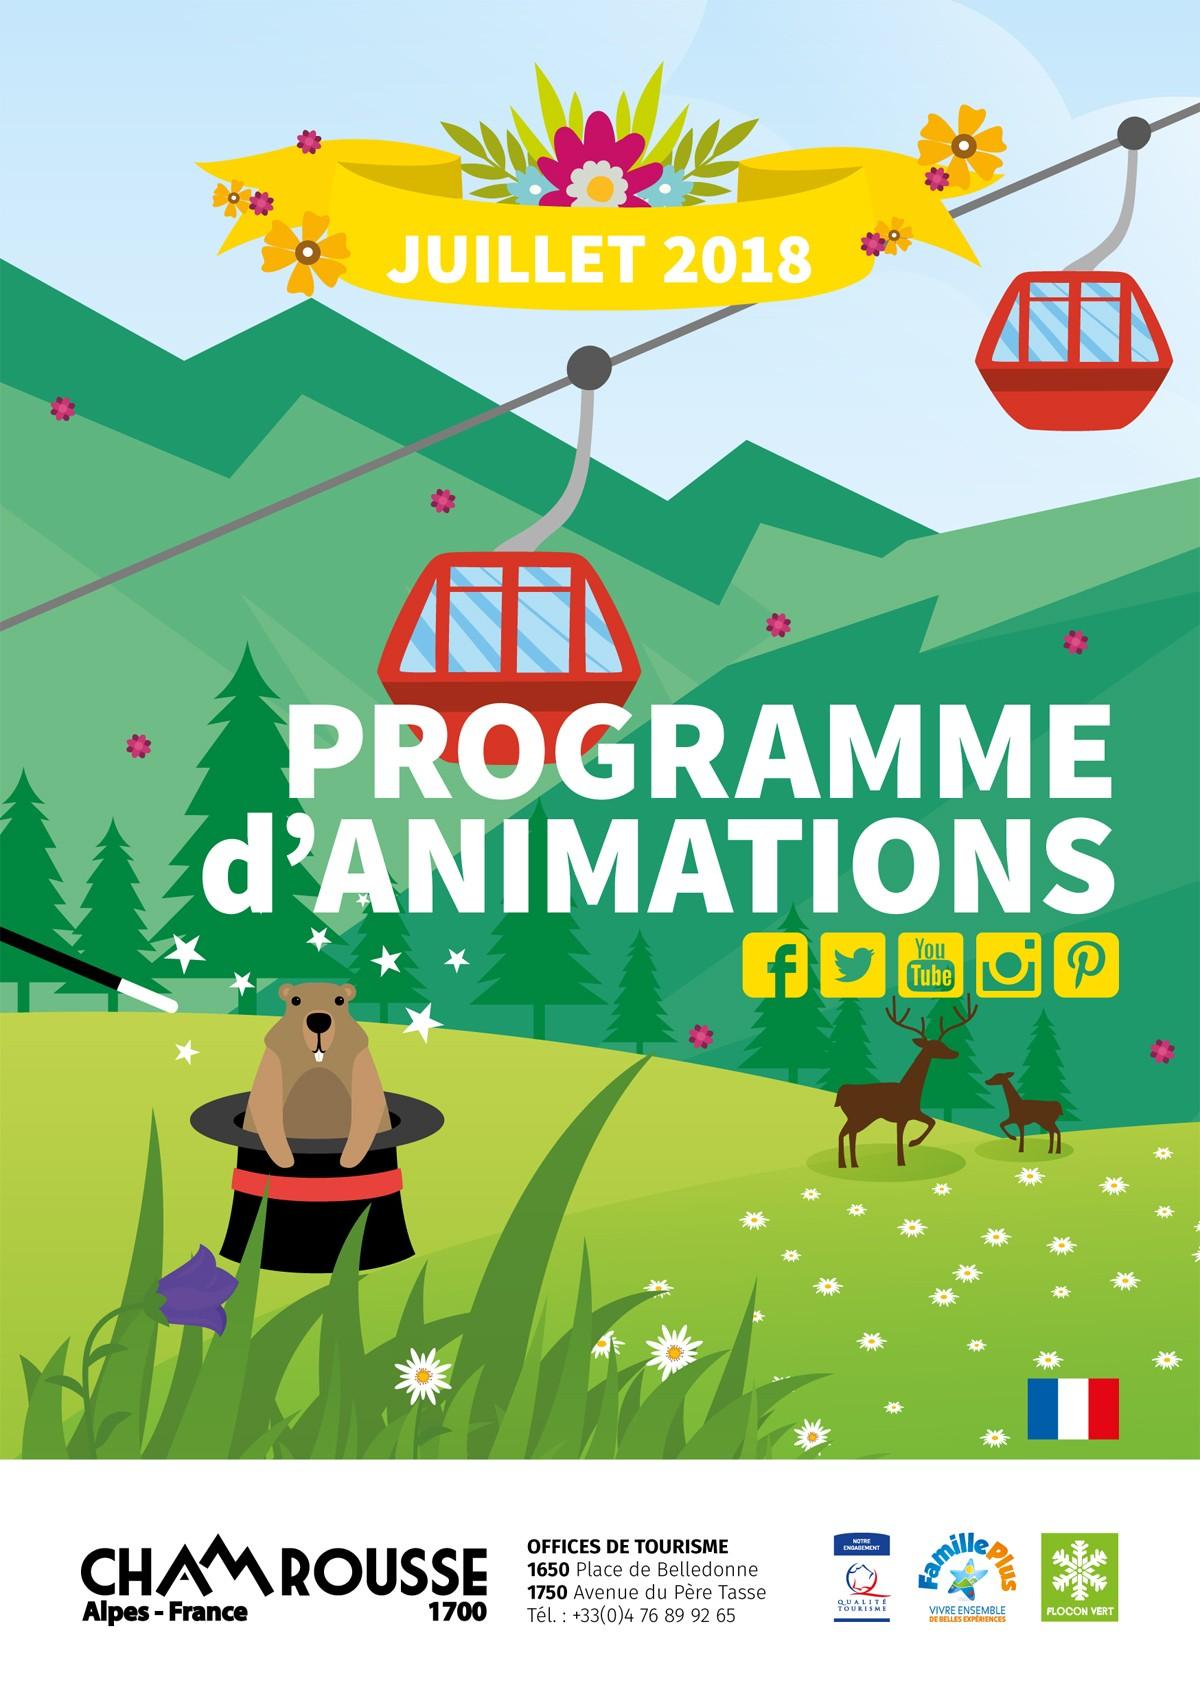 animations-ete18-couv-fr-v1-1-2182